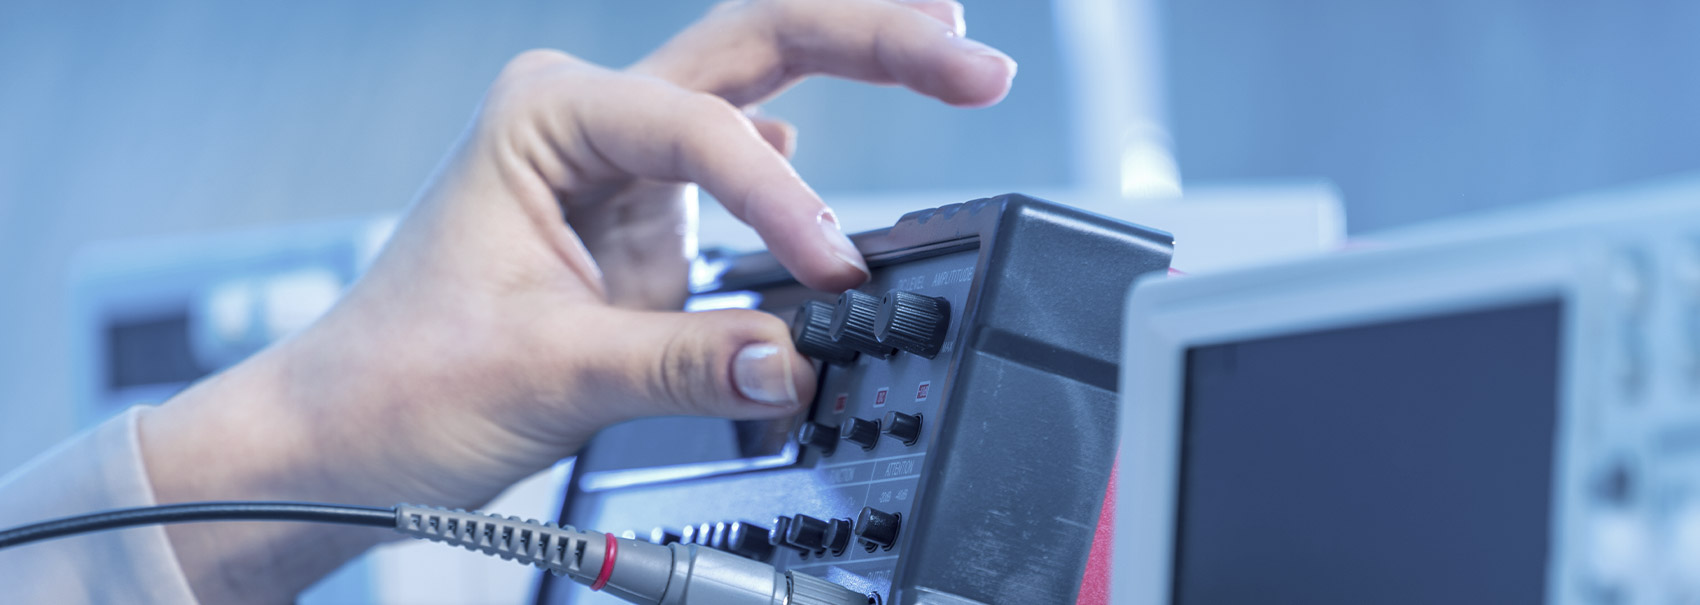 Laboratory Test Instruments